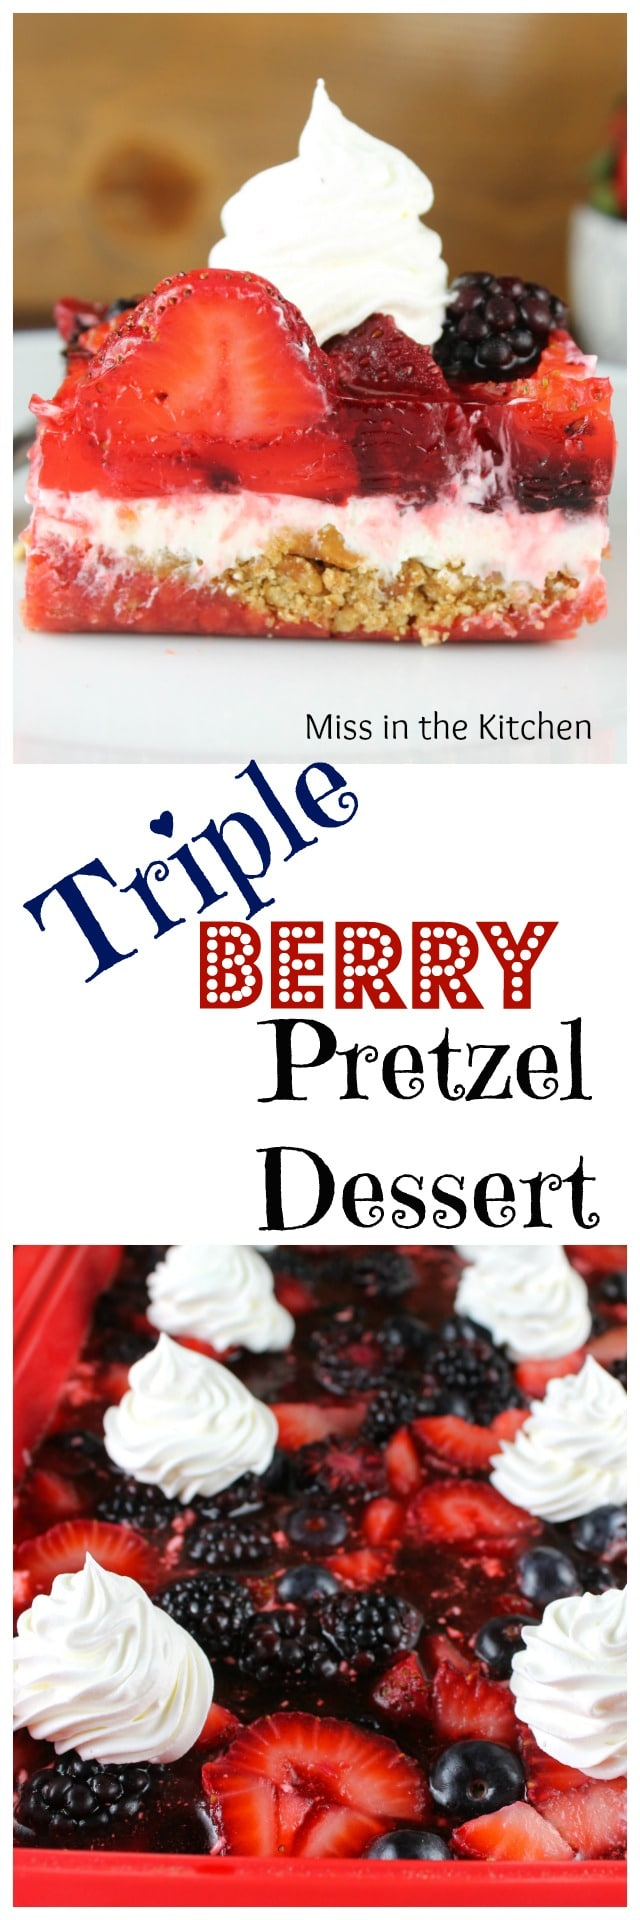 Recipe for Triple Berry Dessert from MissintheKitchen.com #ProgressiveEats